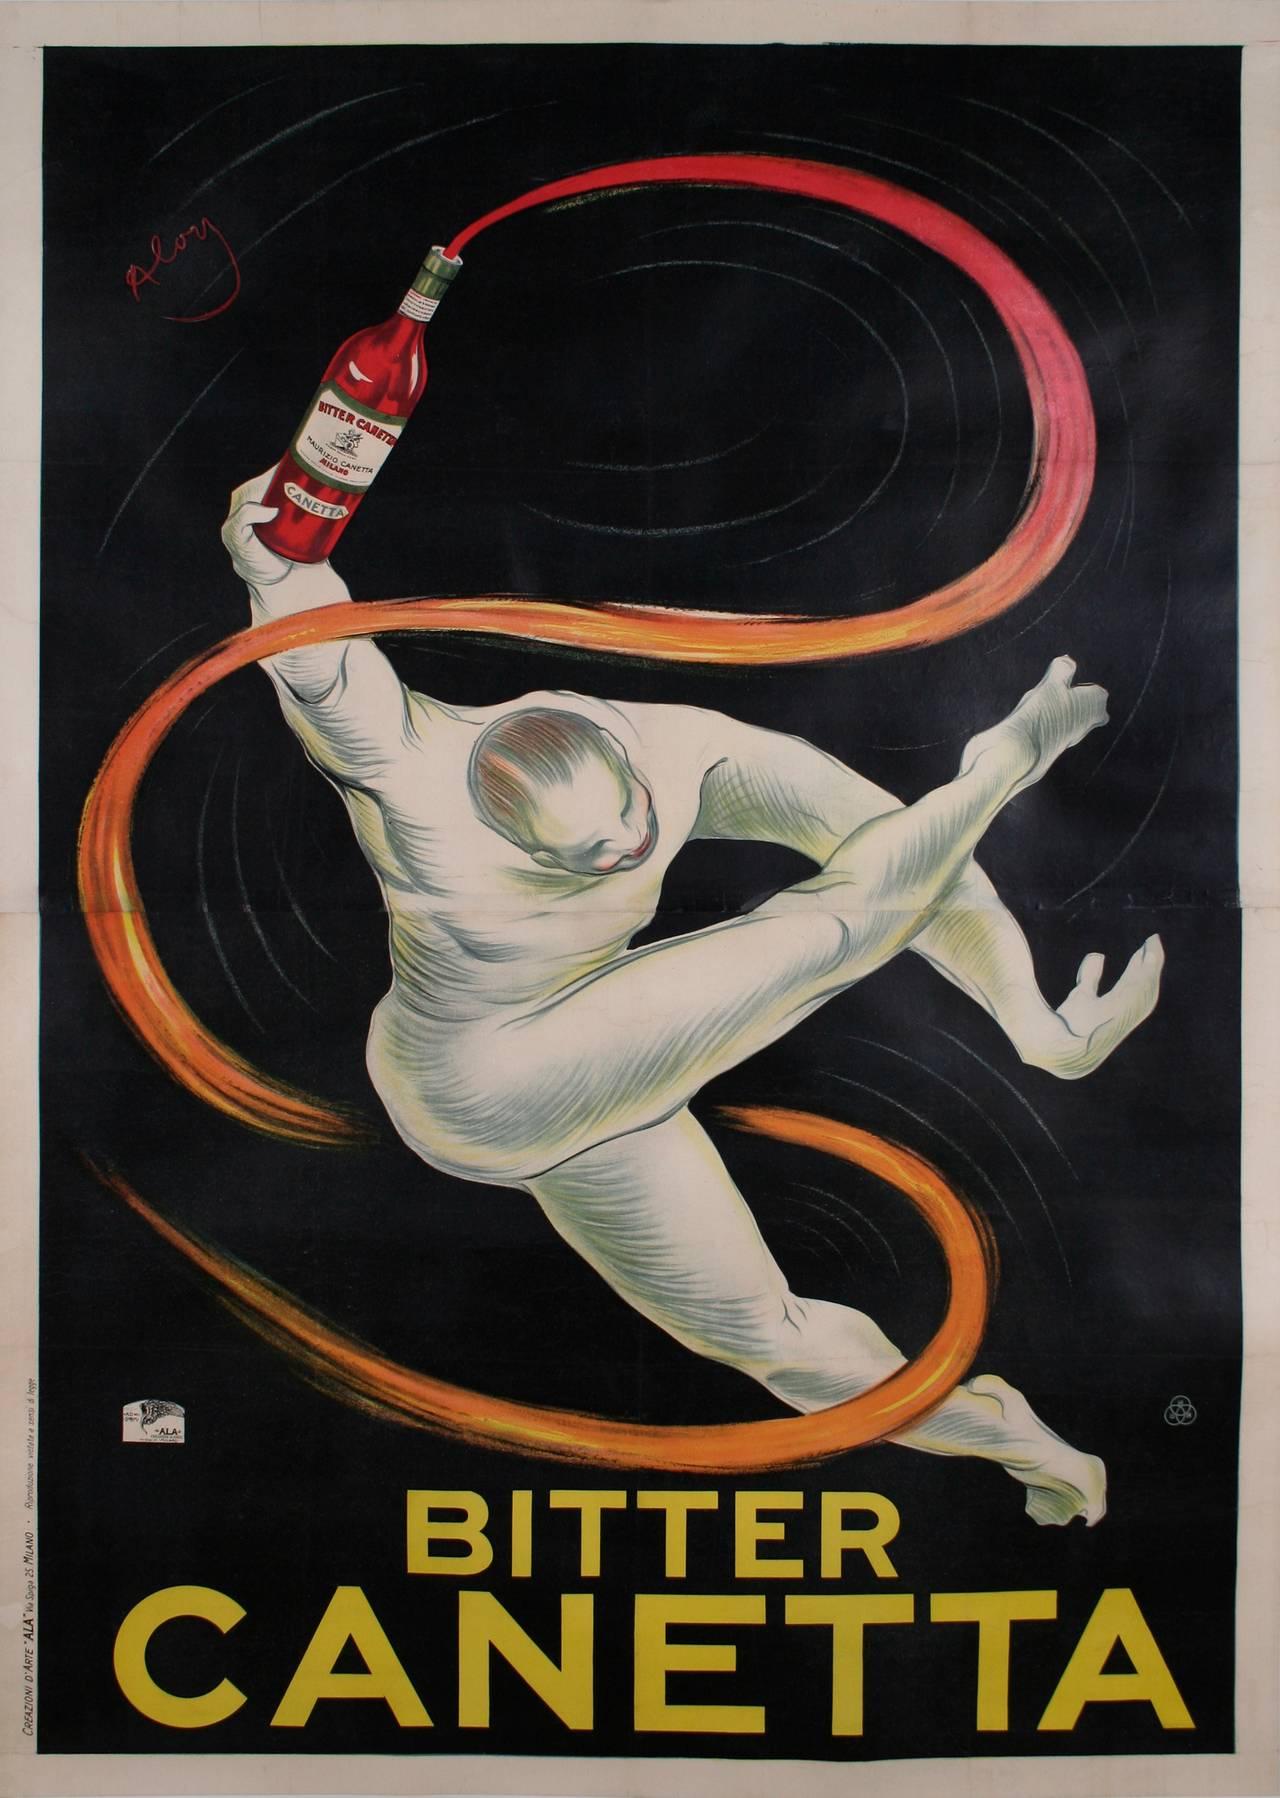 """Bitter Canetta,"" an Italian Art Deco Period Liquor Poster by Roberto Aloy, 1925 2"